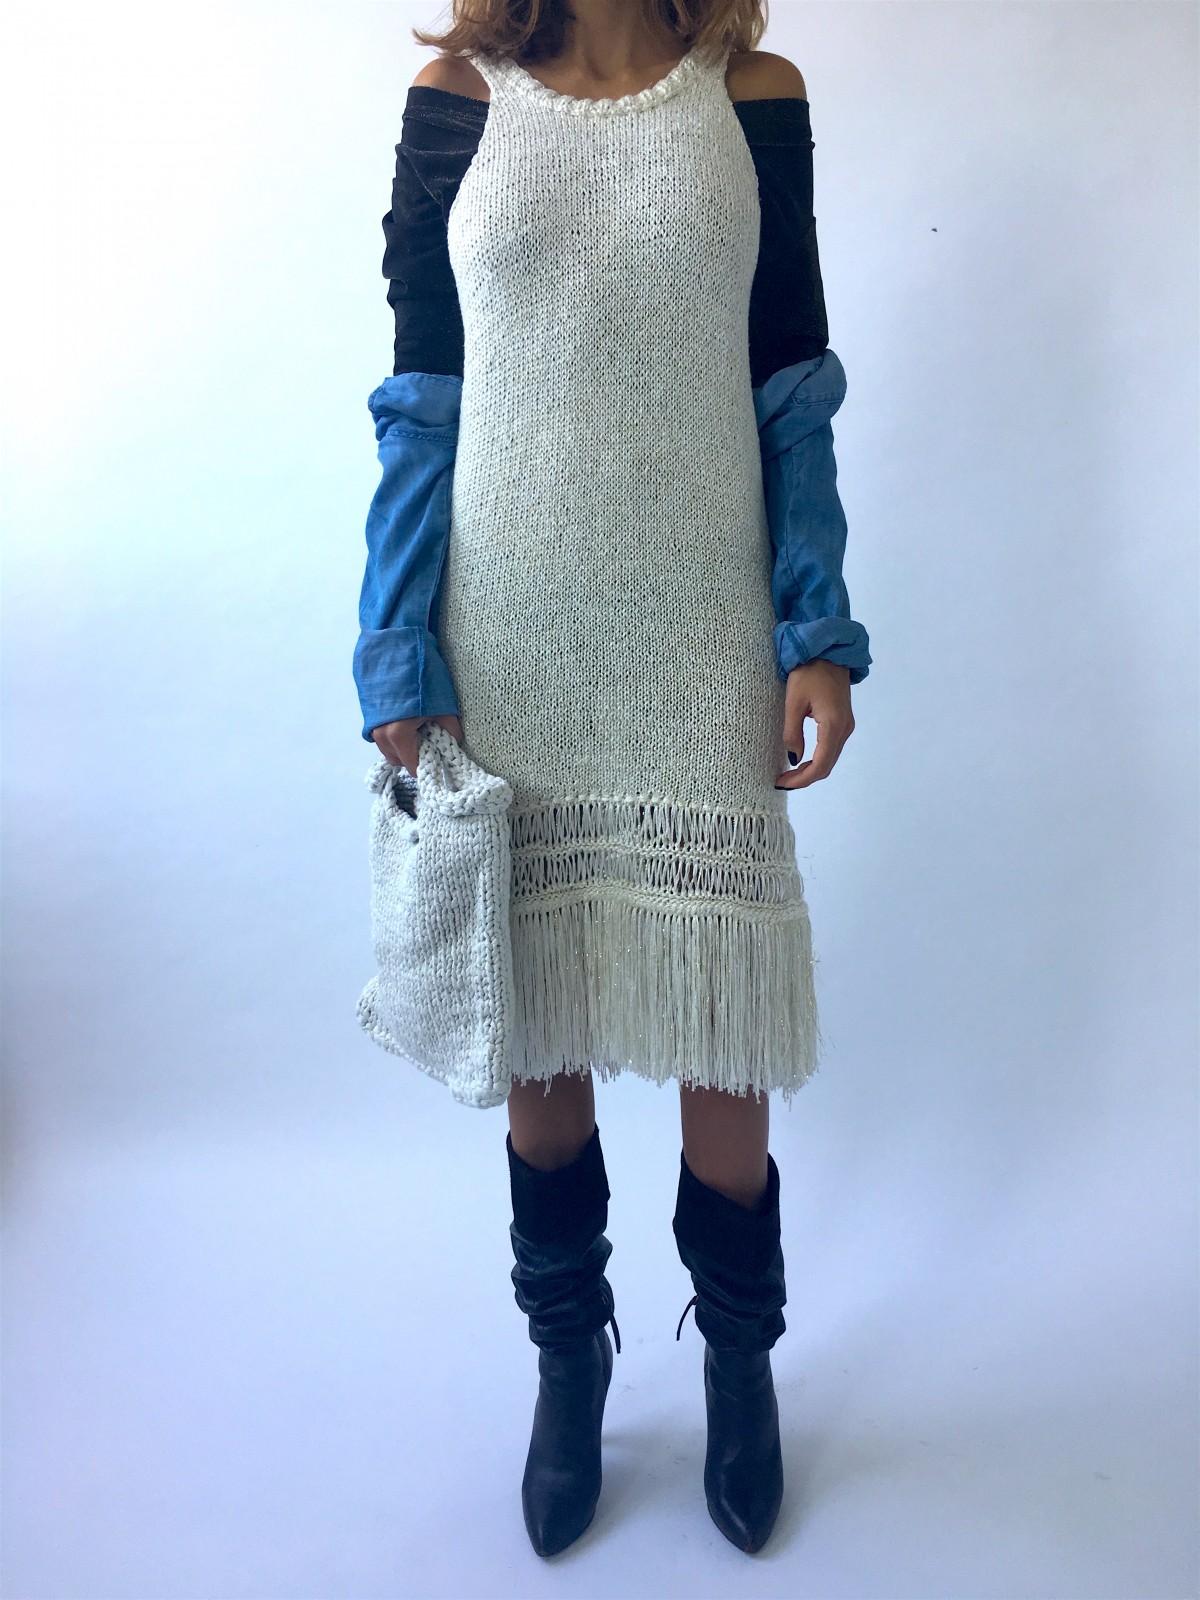 L'inconnue Fall 2016-2017, rochia Maria